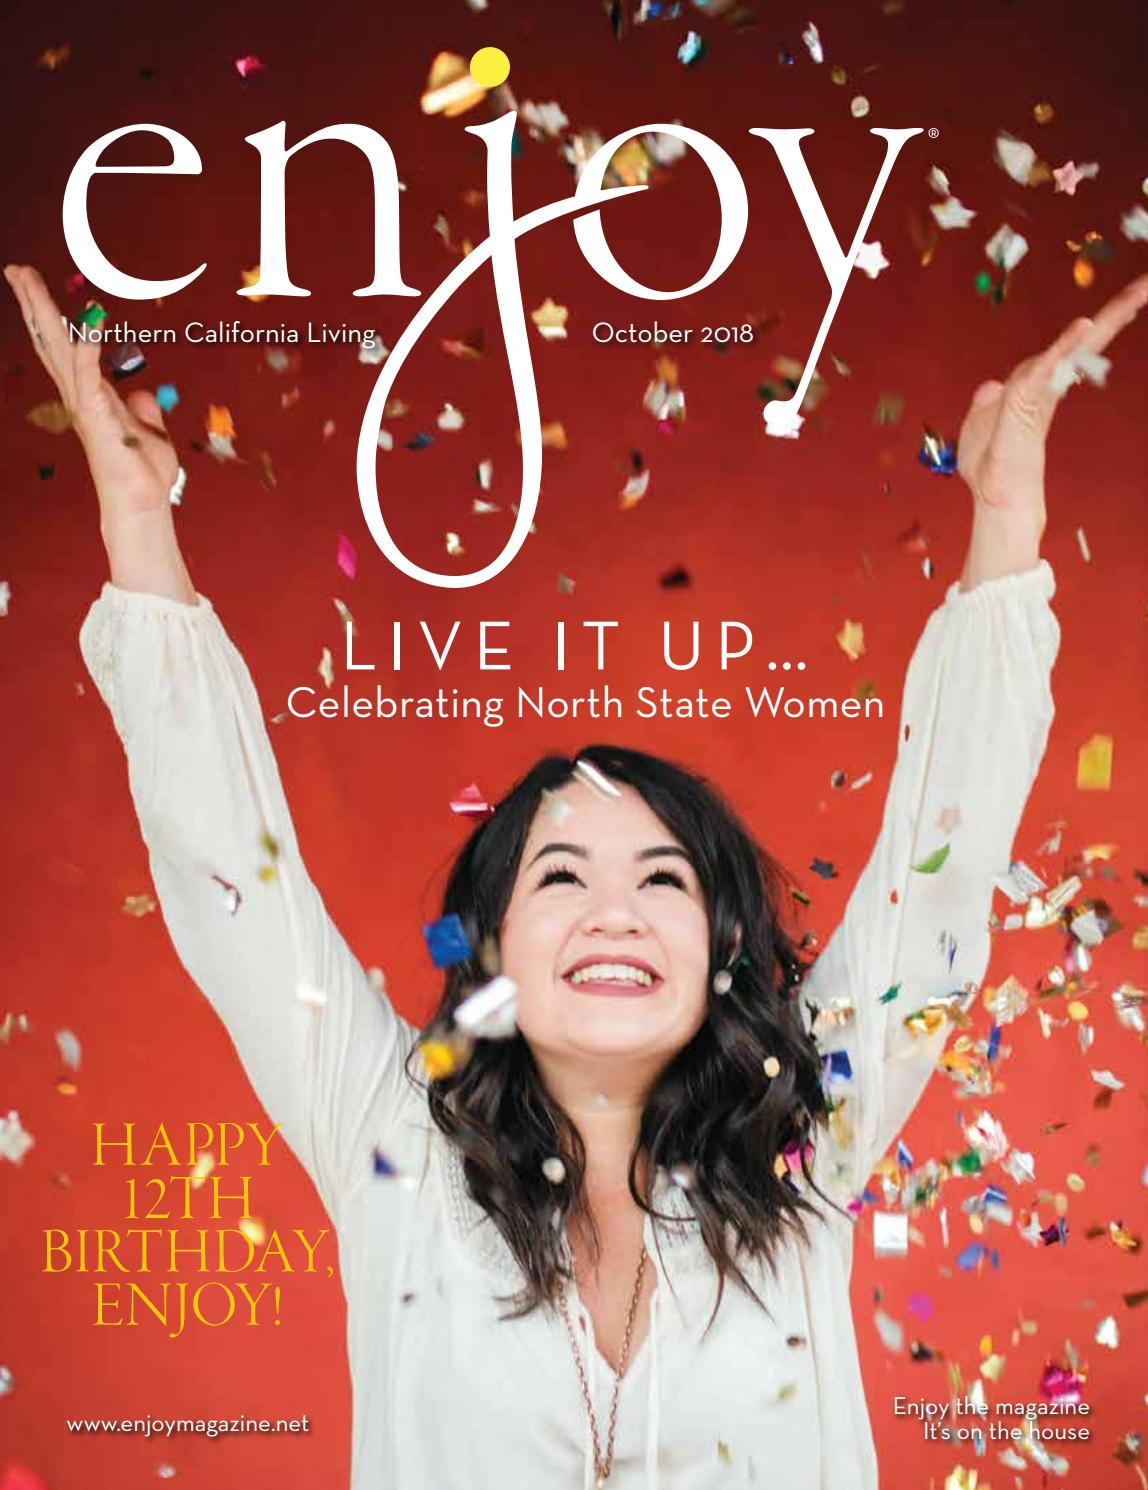 14ddb0171 Enjoy Magazine  Northern California Living—October 2018 by Enjoy Magazine -  issuu